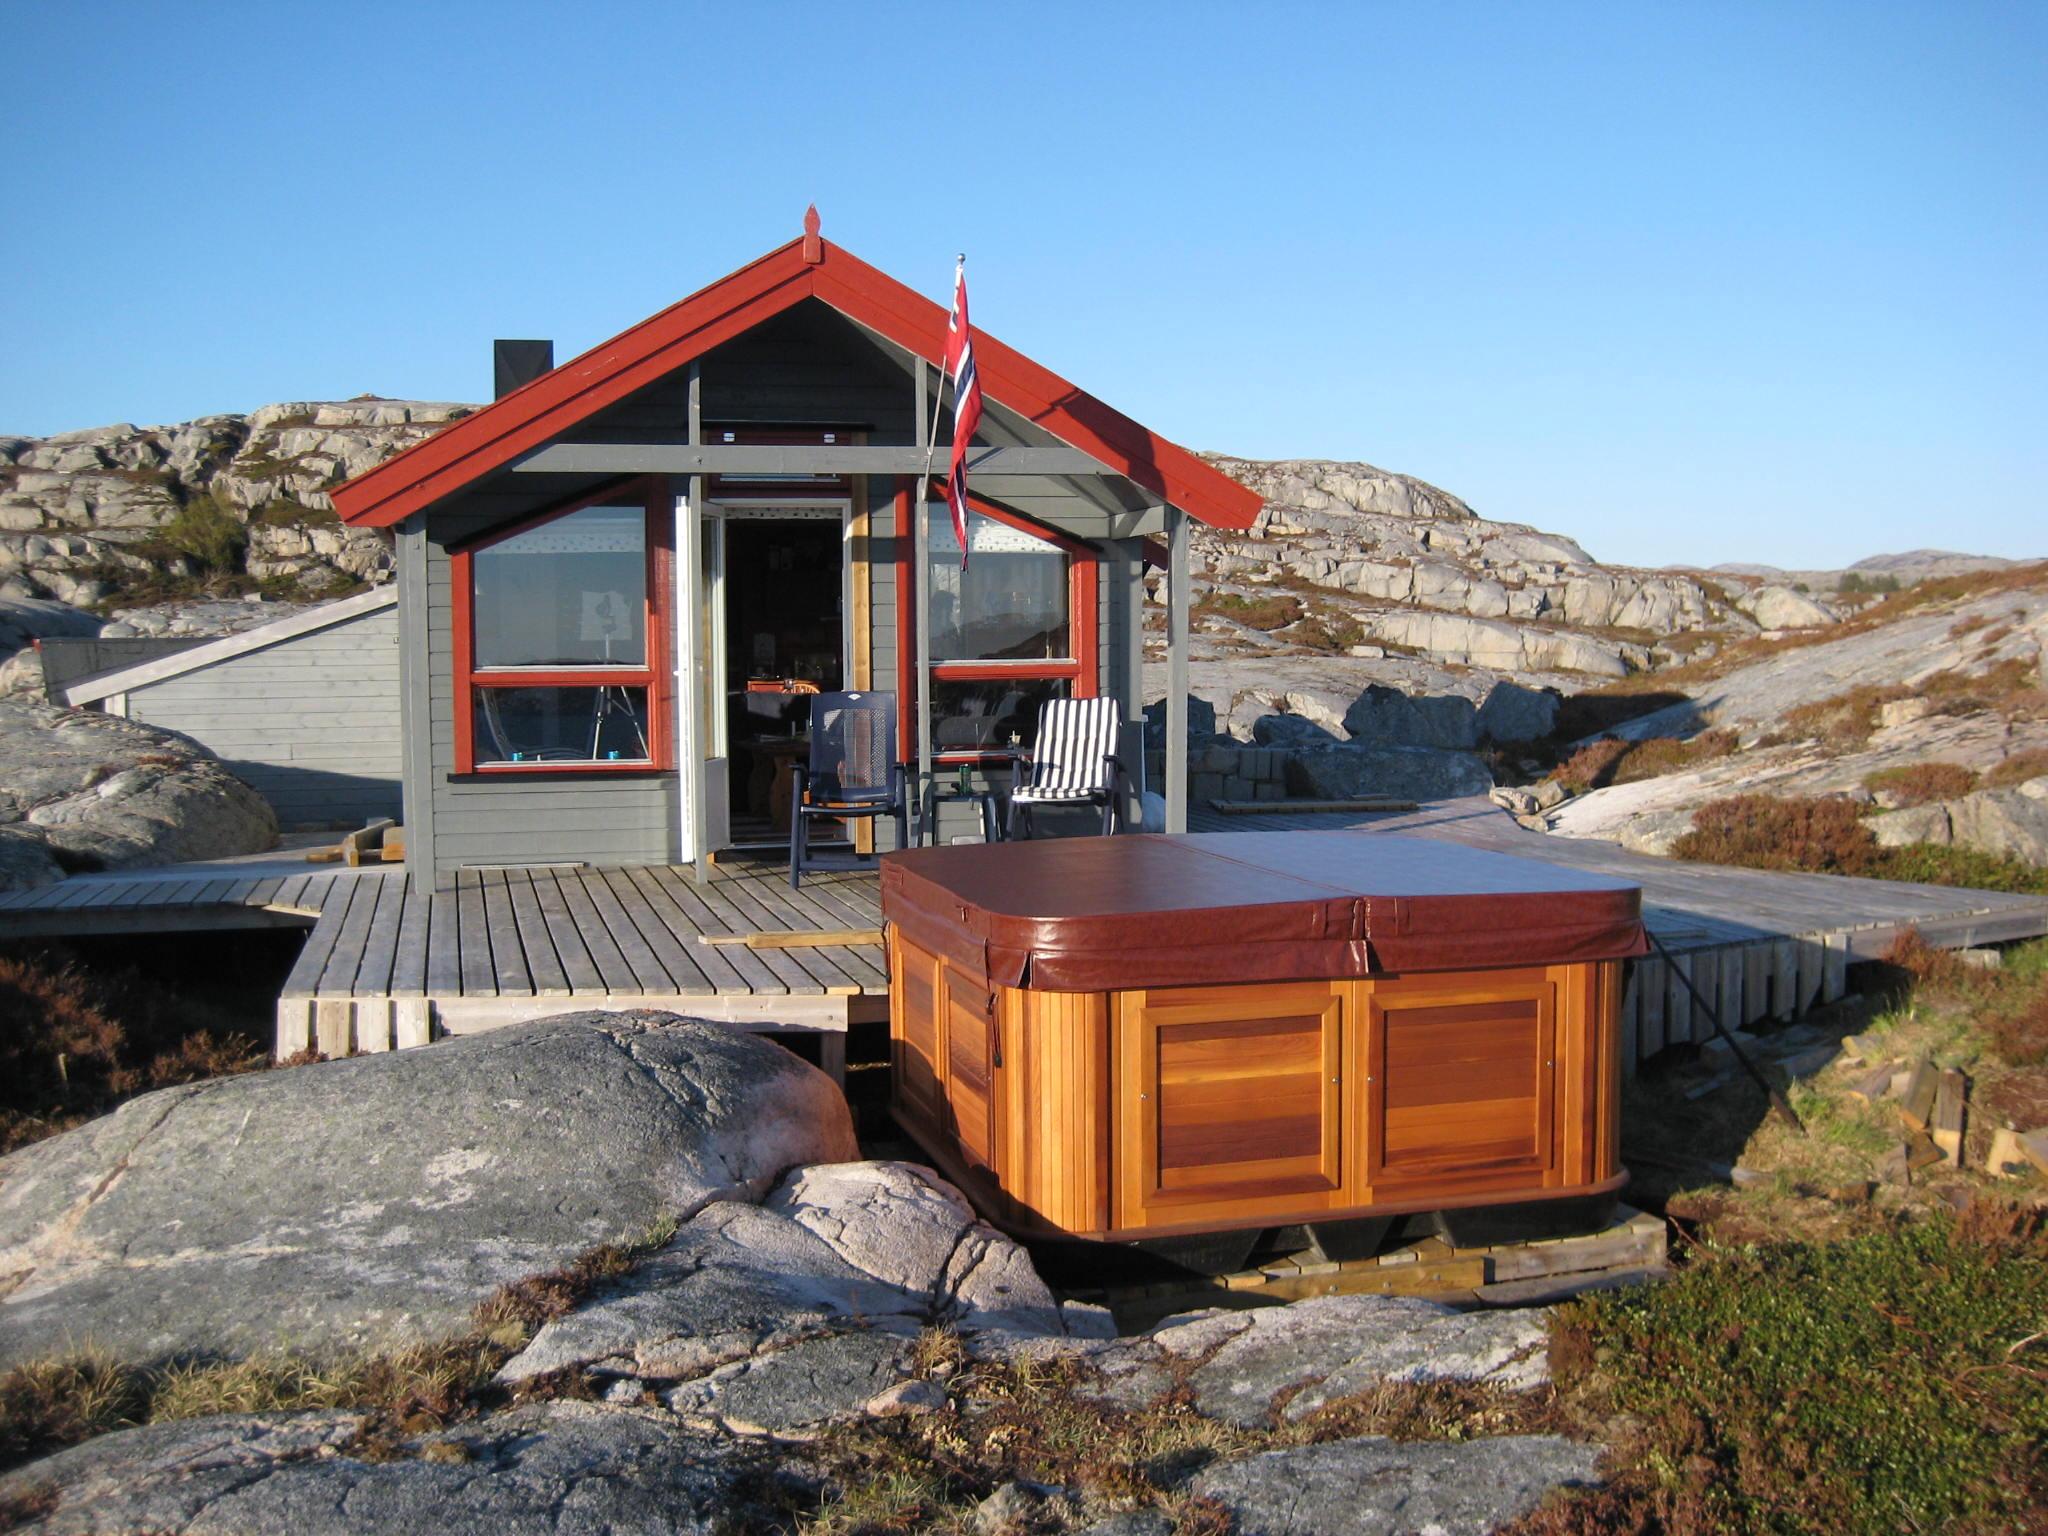 Spa-helikopter-norway-arctic-spas-hot-tub